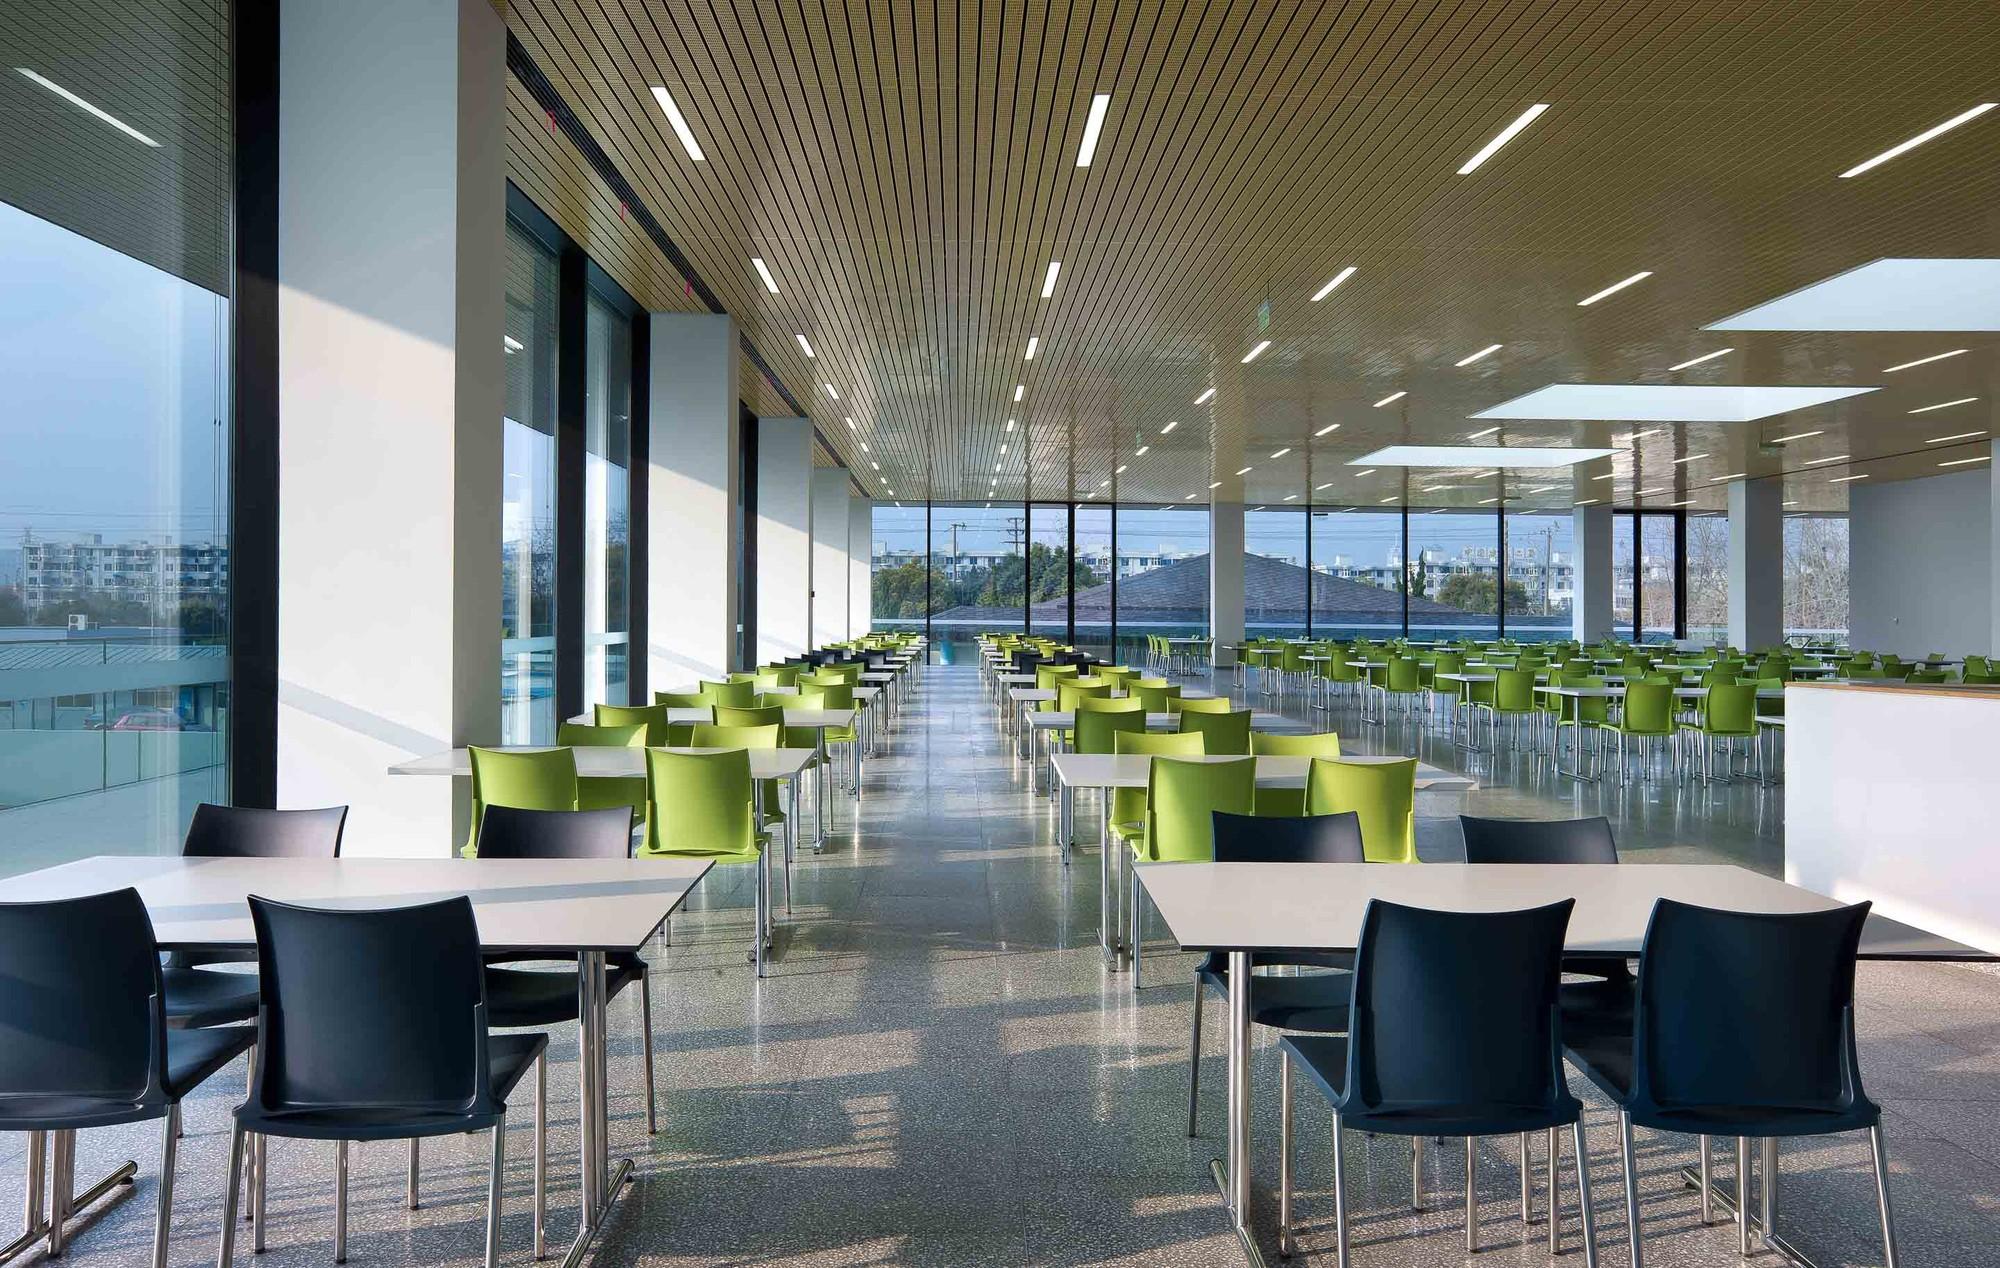 Gallery of Roche Canteen  EXH Design  16